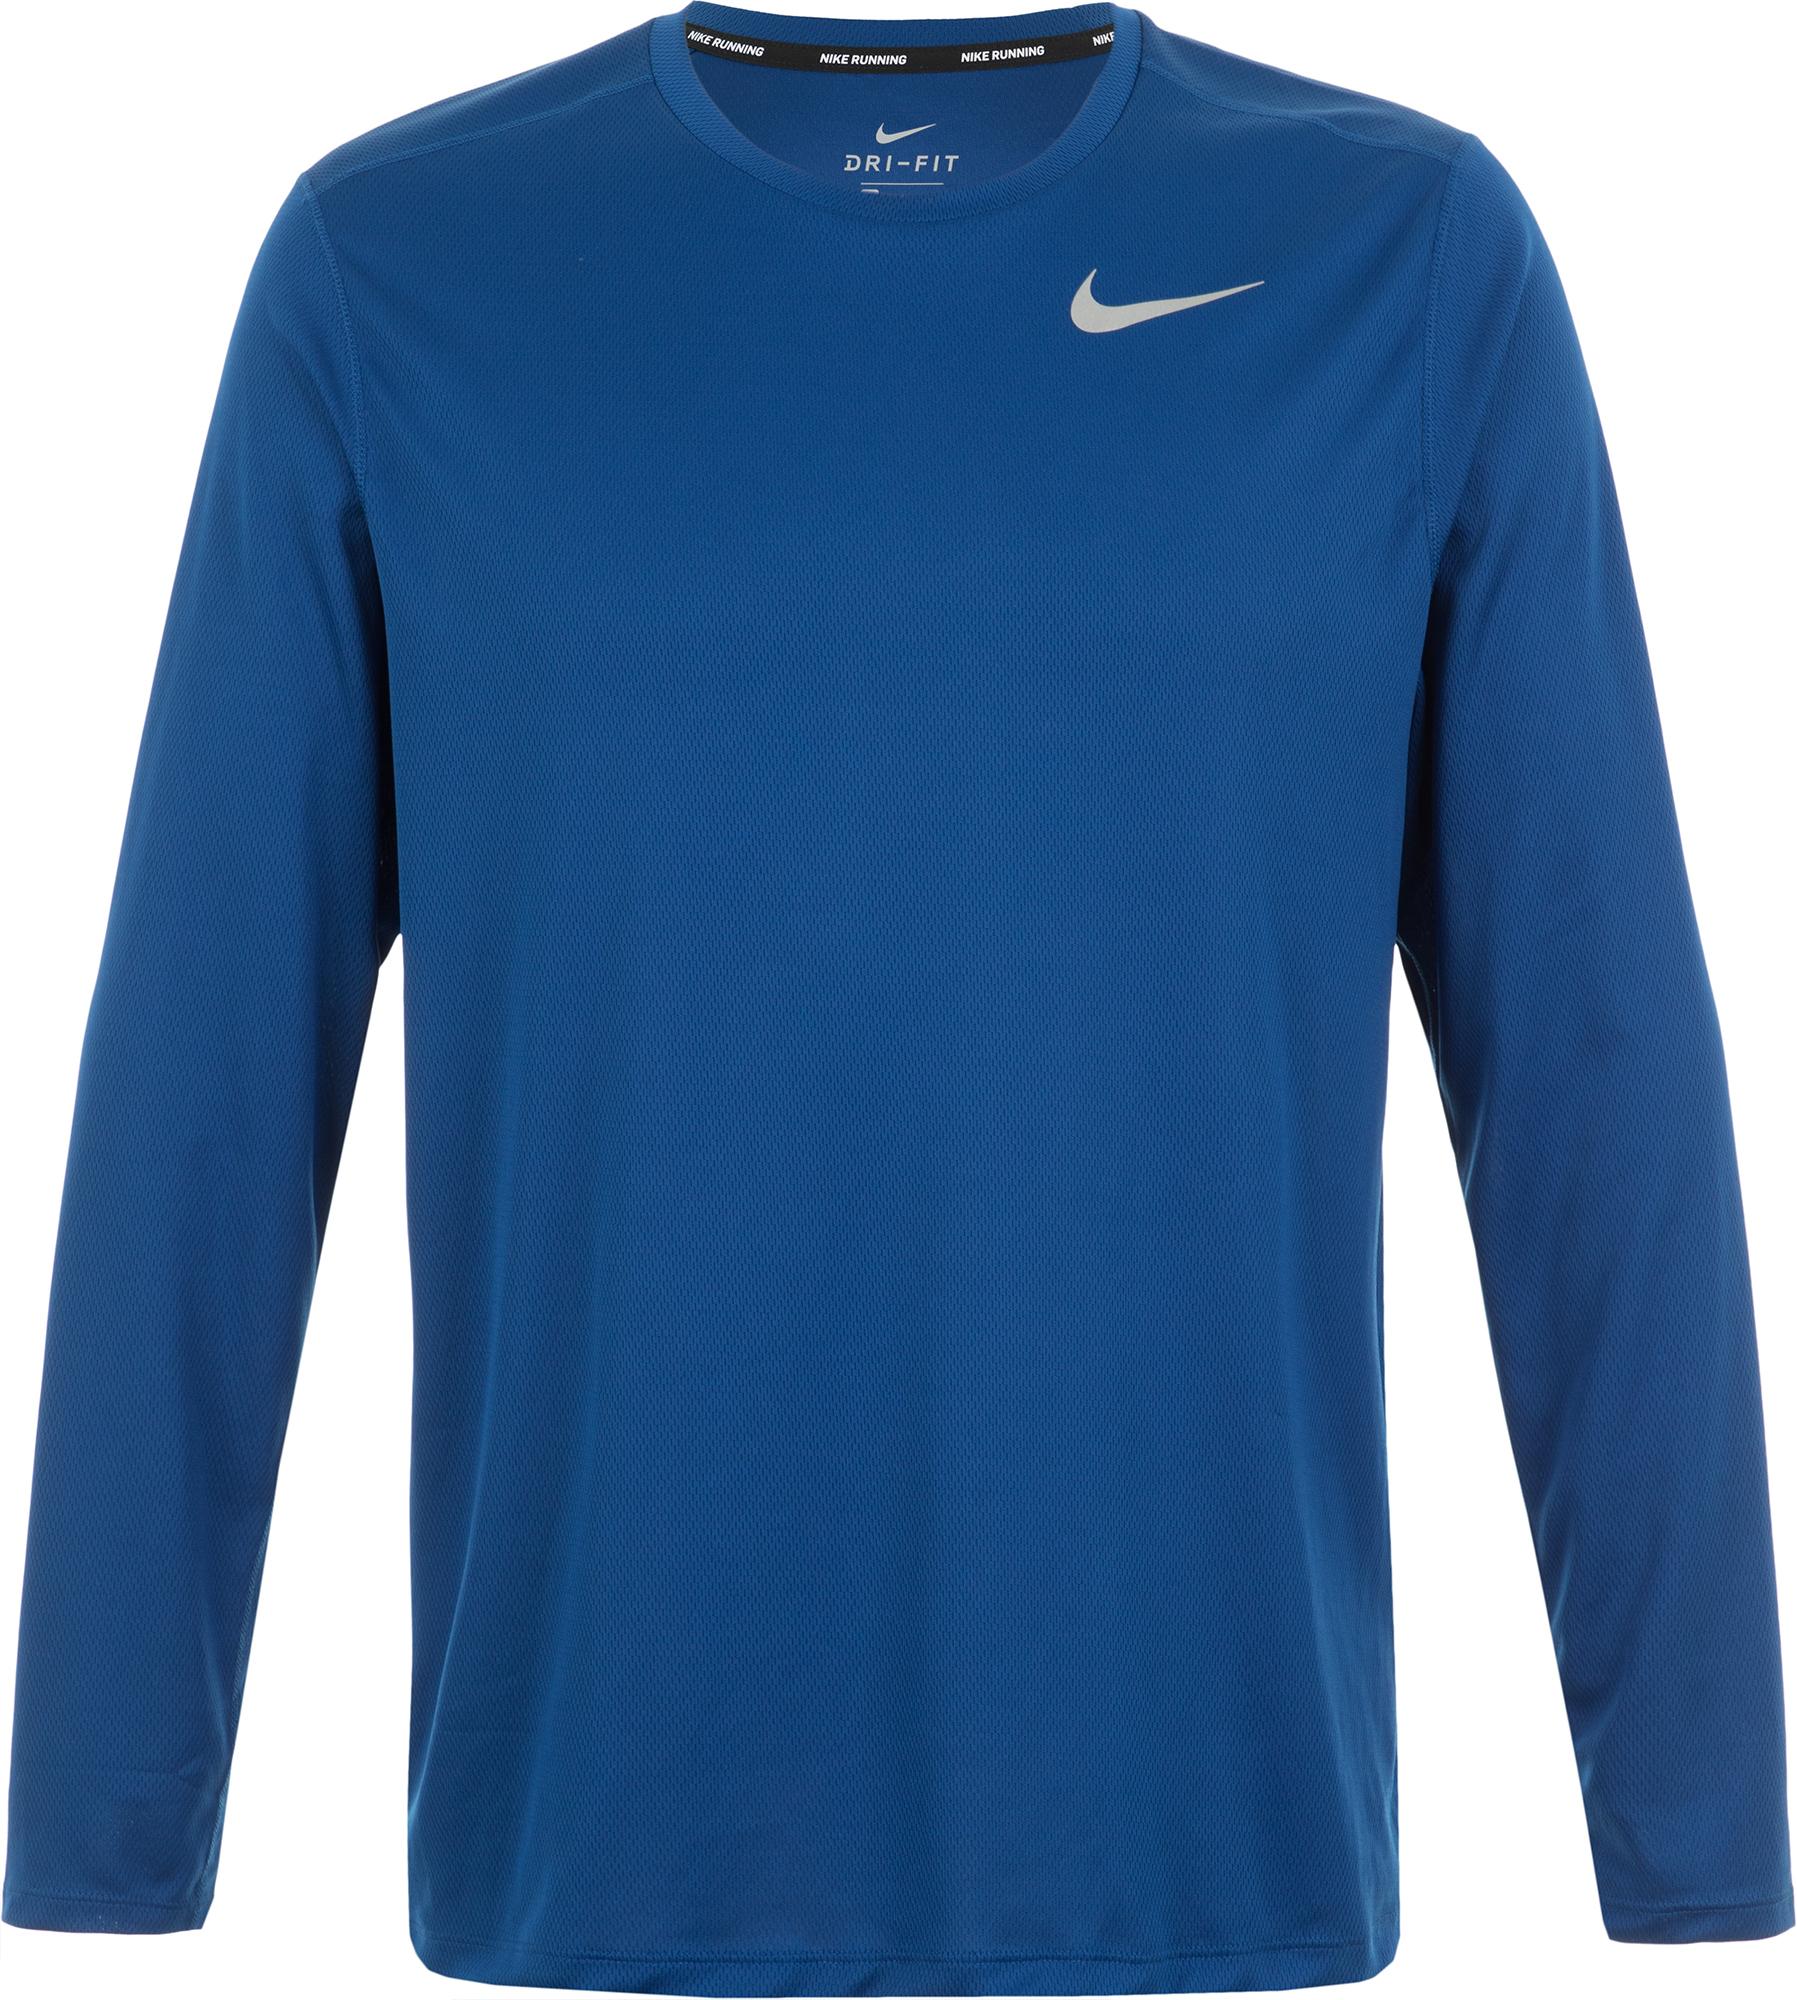 Nike Лонгслив мужской Nike Breathe, размер 46-48 лонгслив мужской oodji basic цвет серый 5b511002m 46737n 2300m размер s 46 48